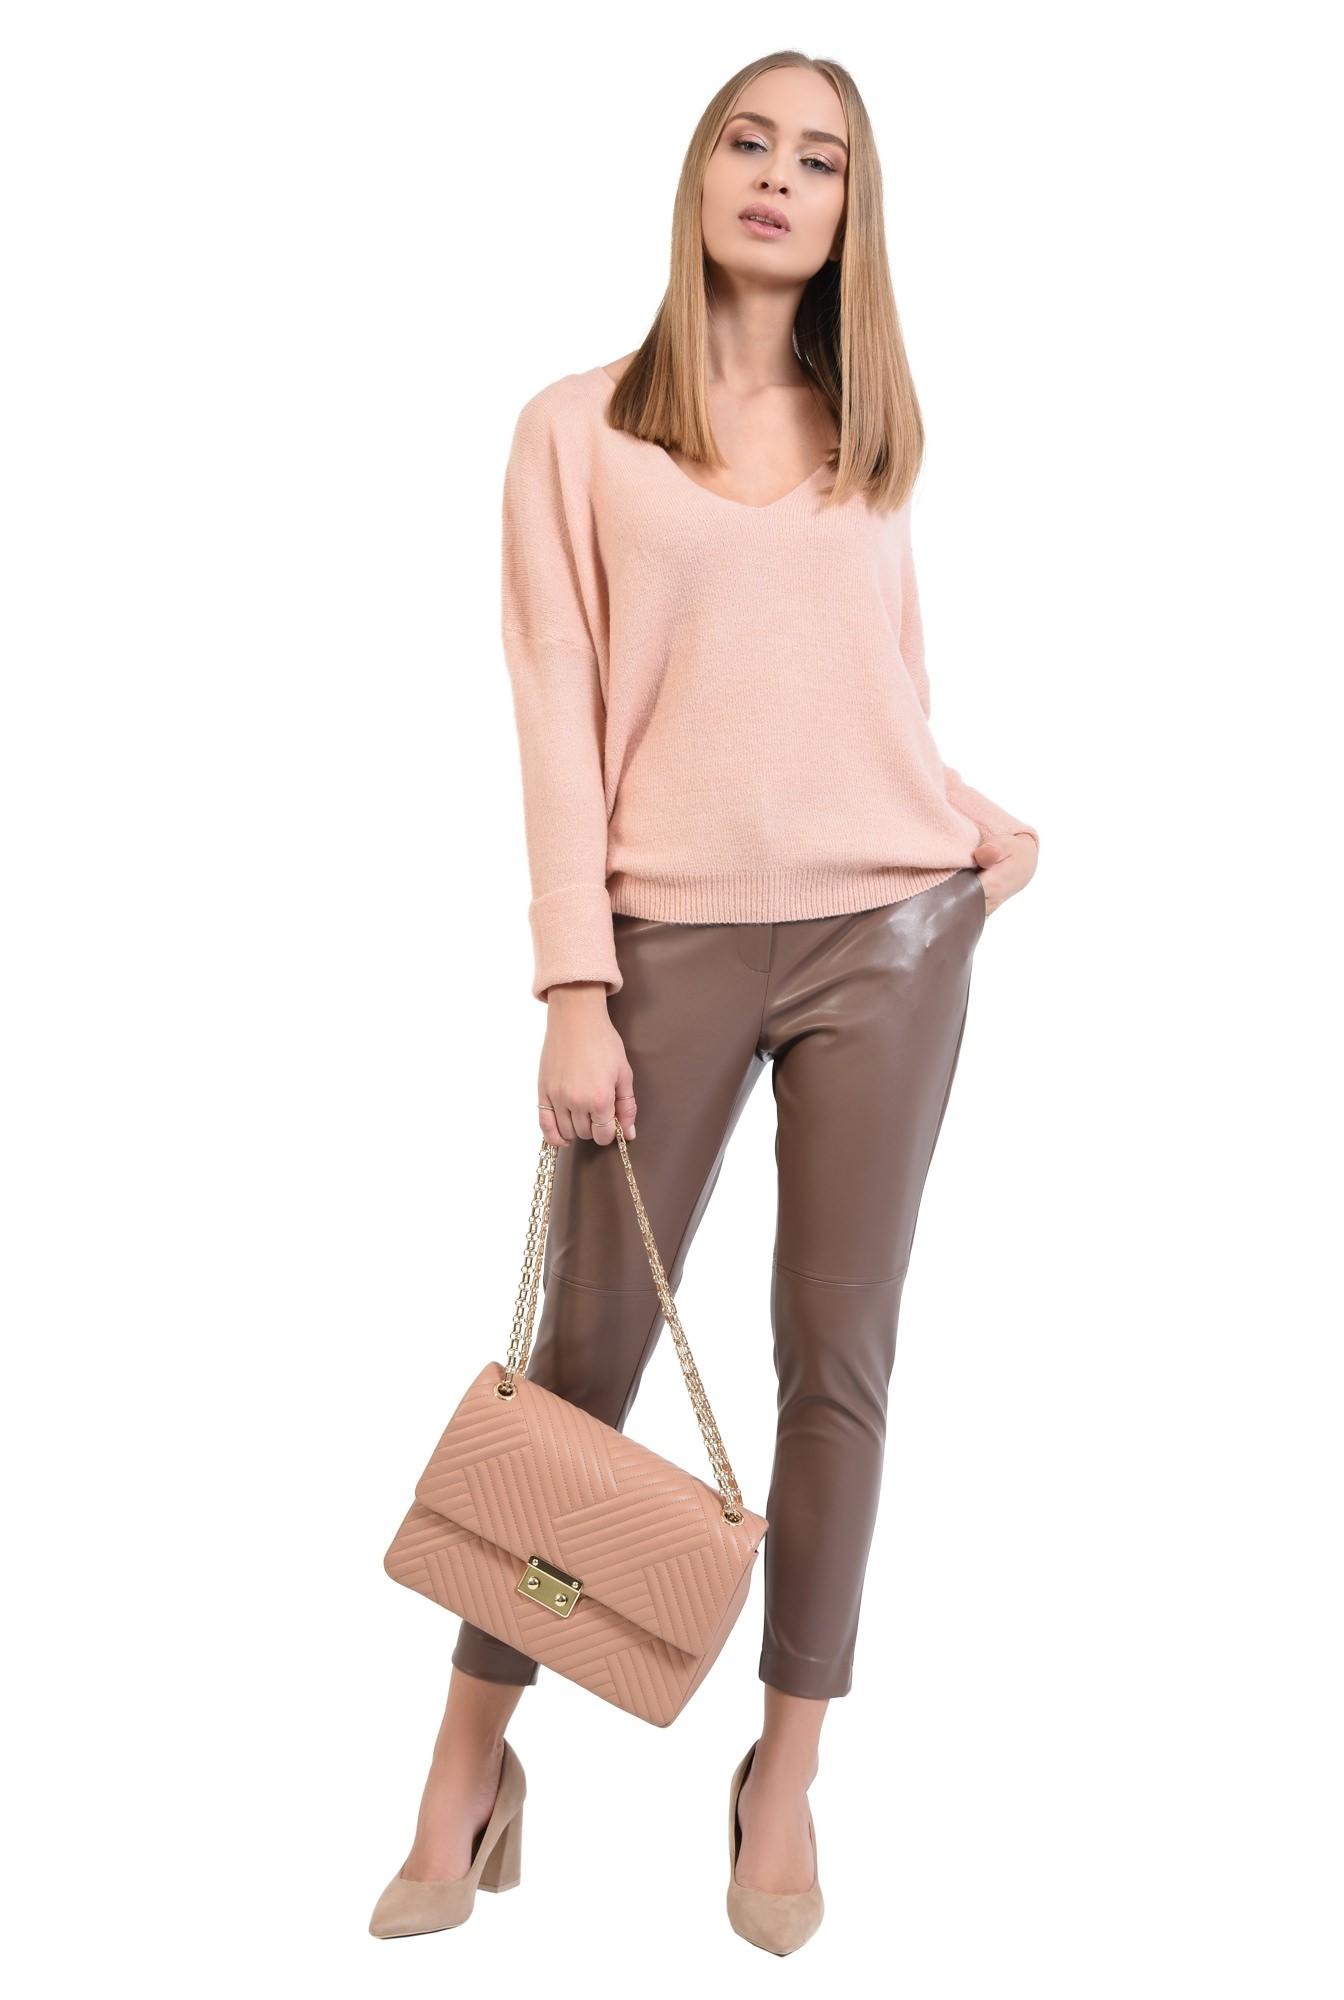 3 - 360 - pulover dama, online, tricotaje, roz, bordura reiata